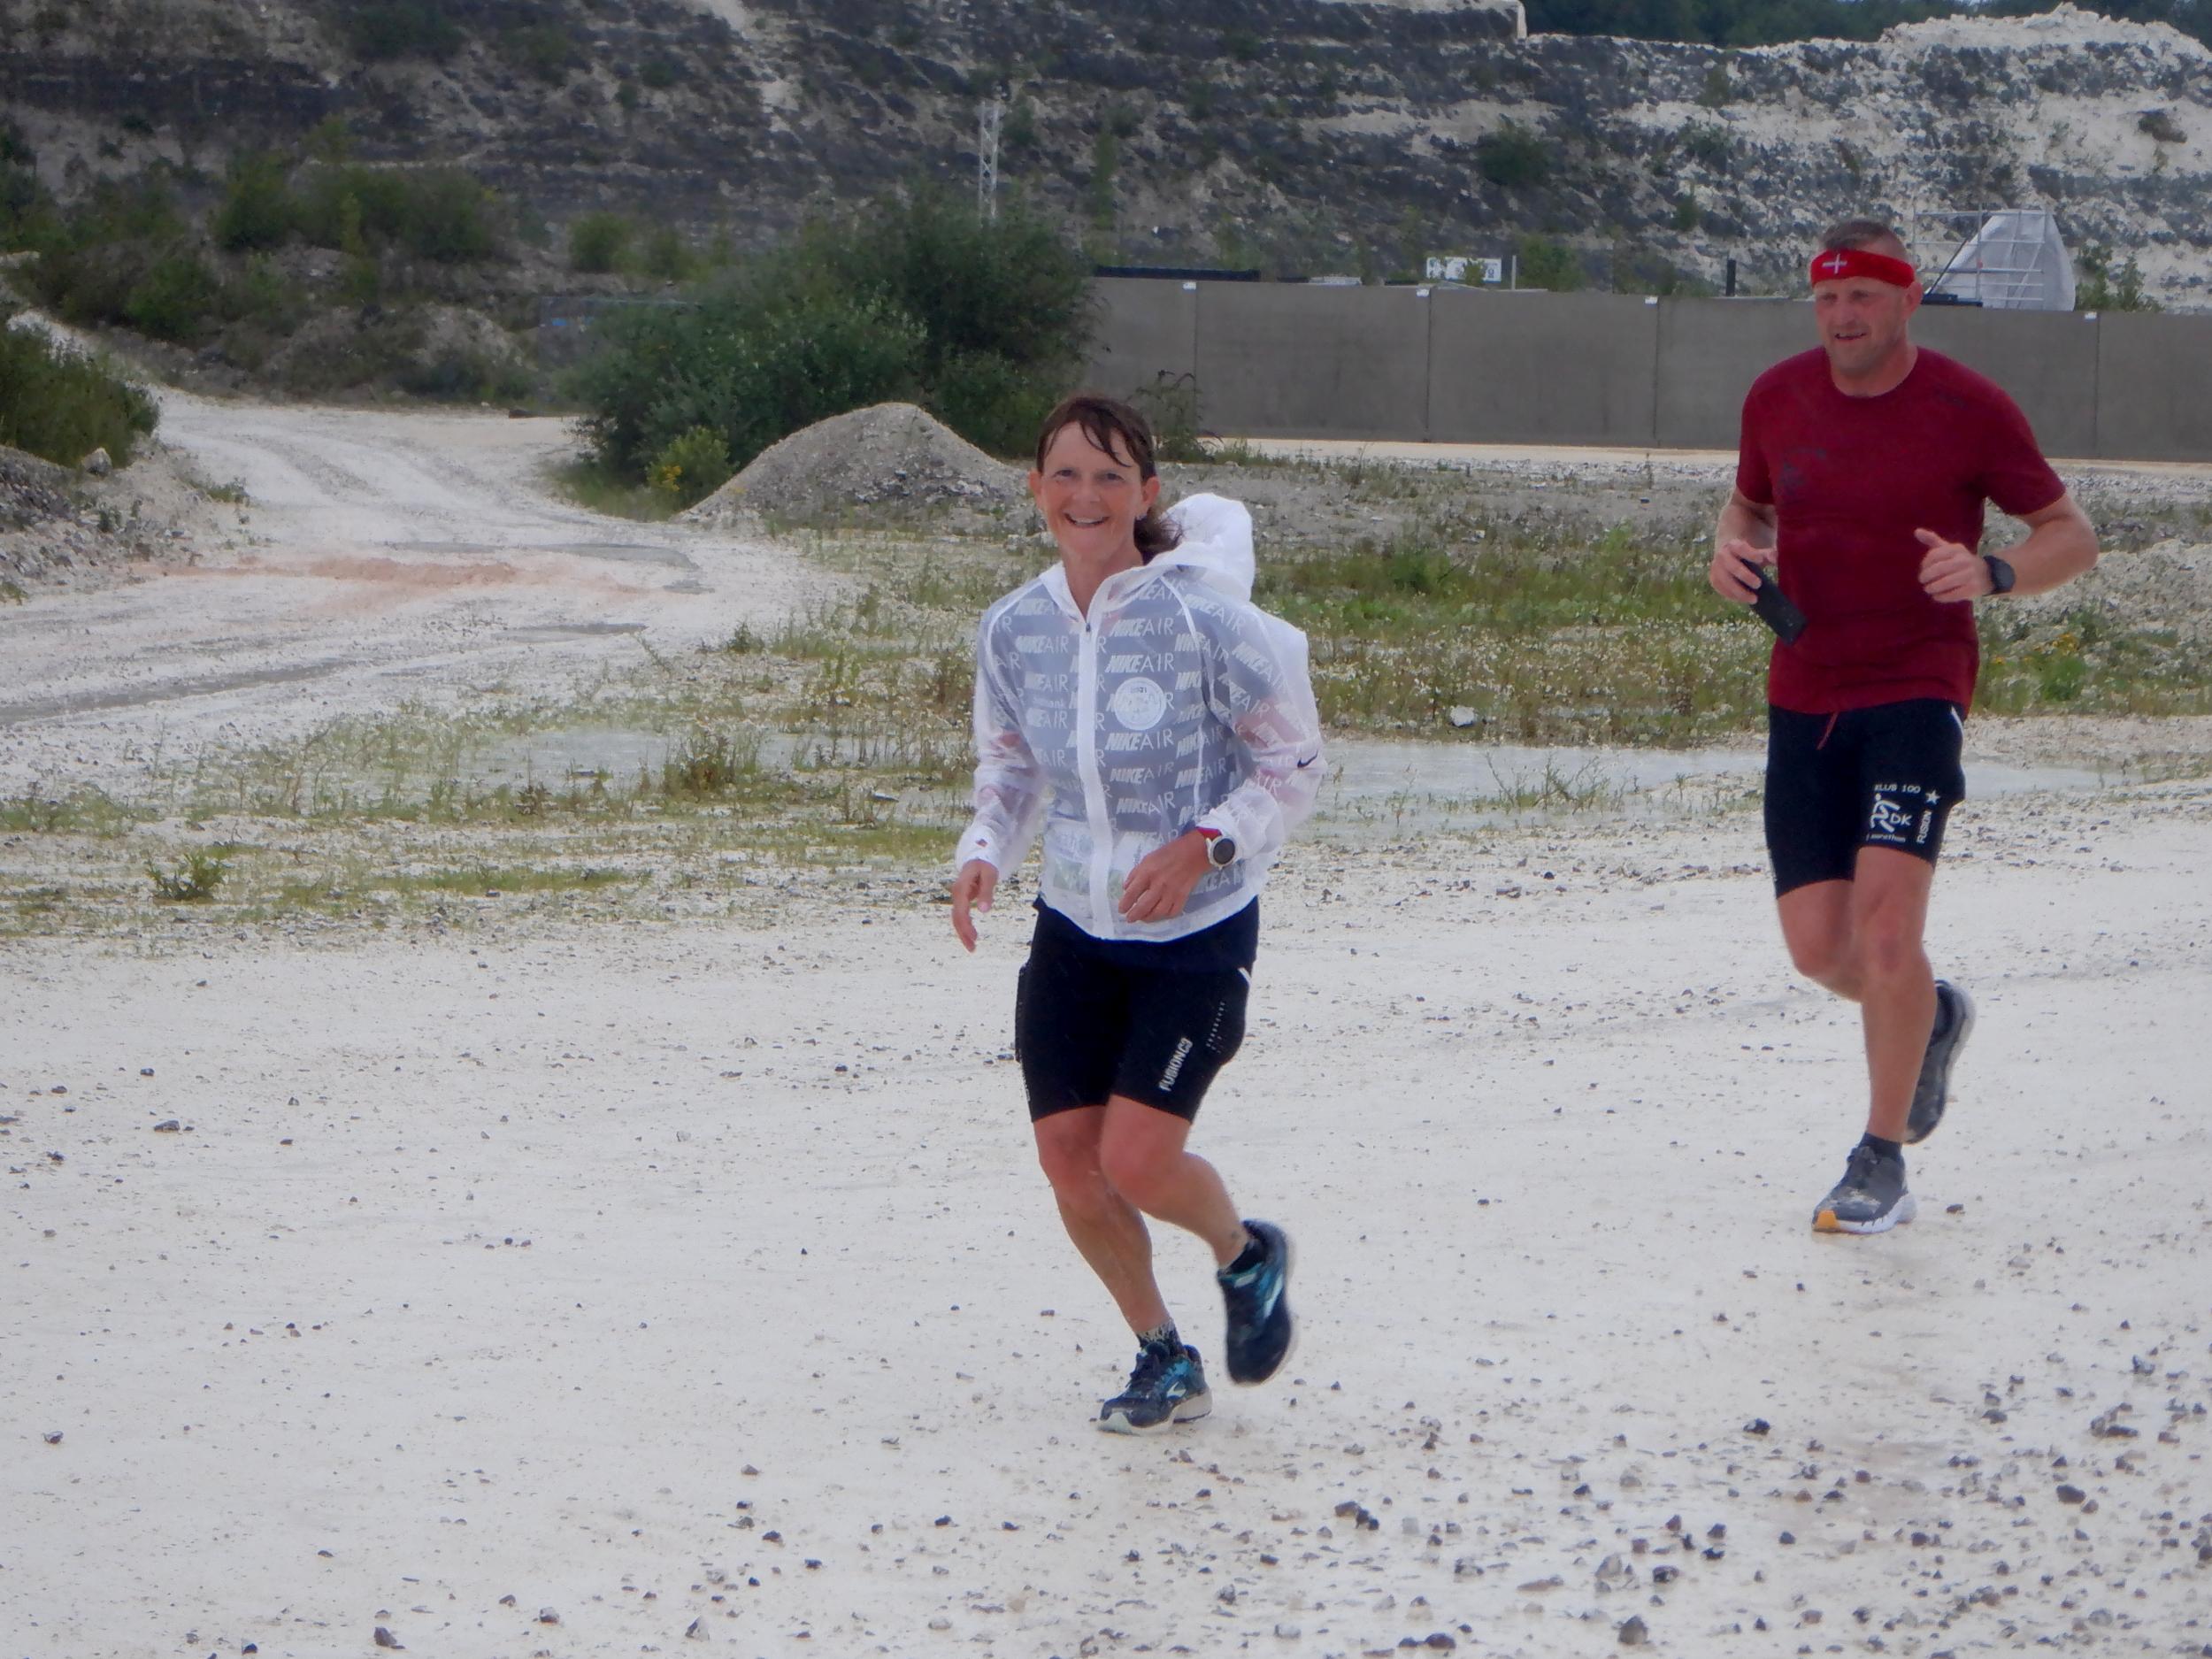 Et par løbere i Faxe Kalkbrud.